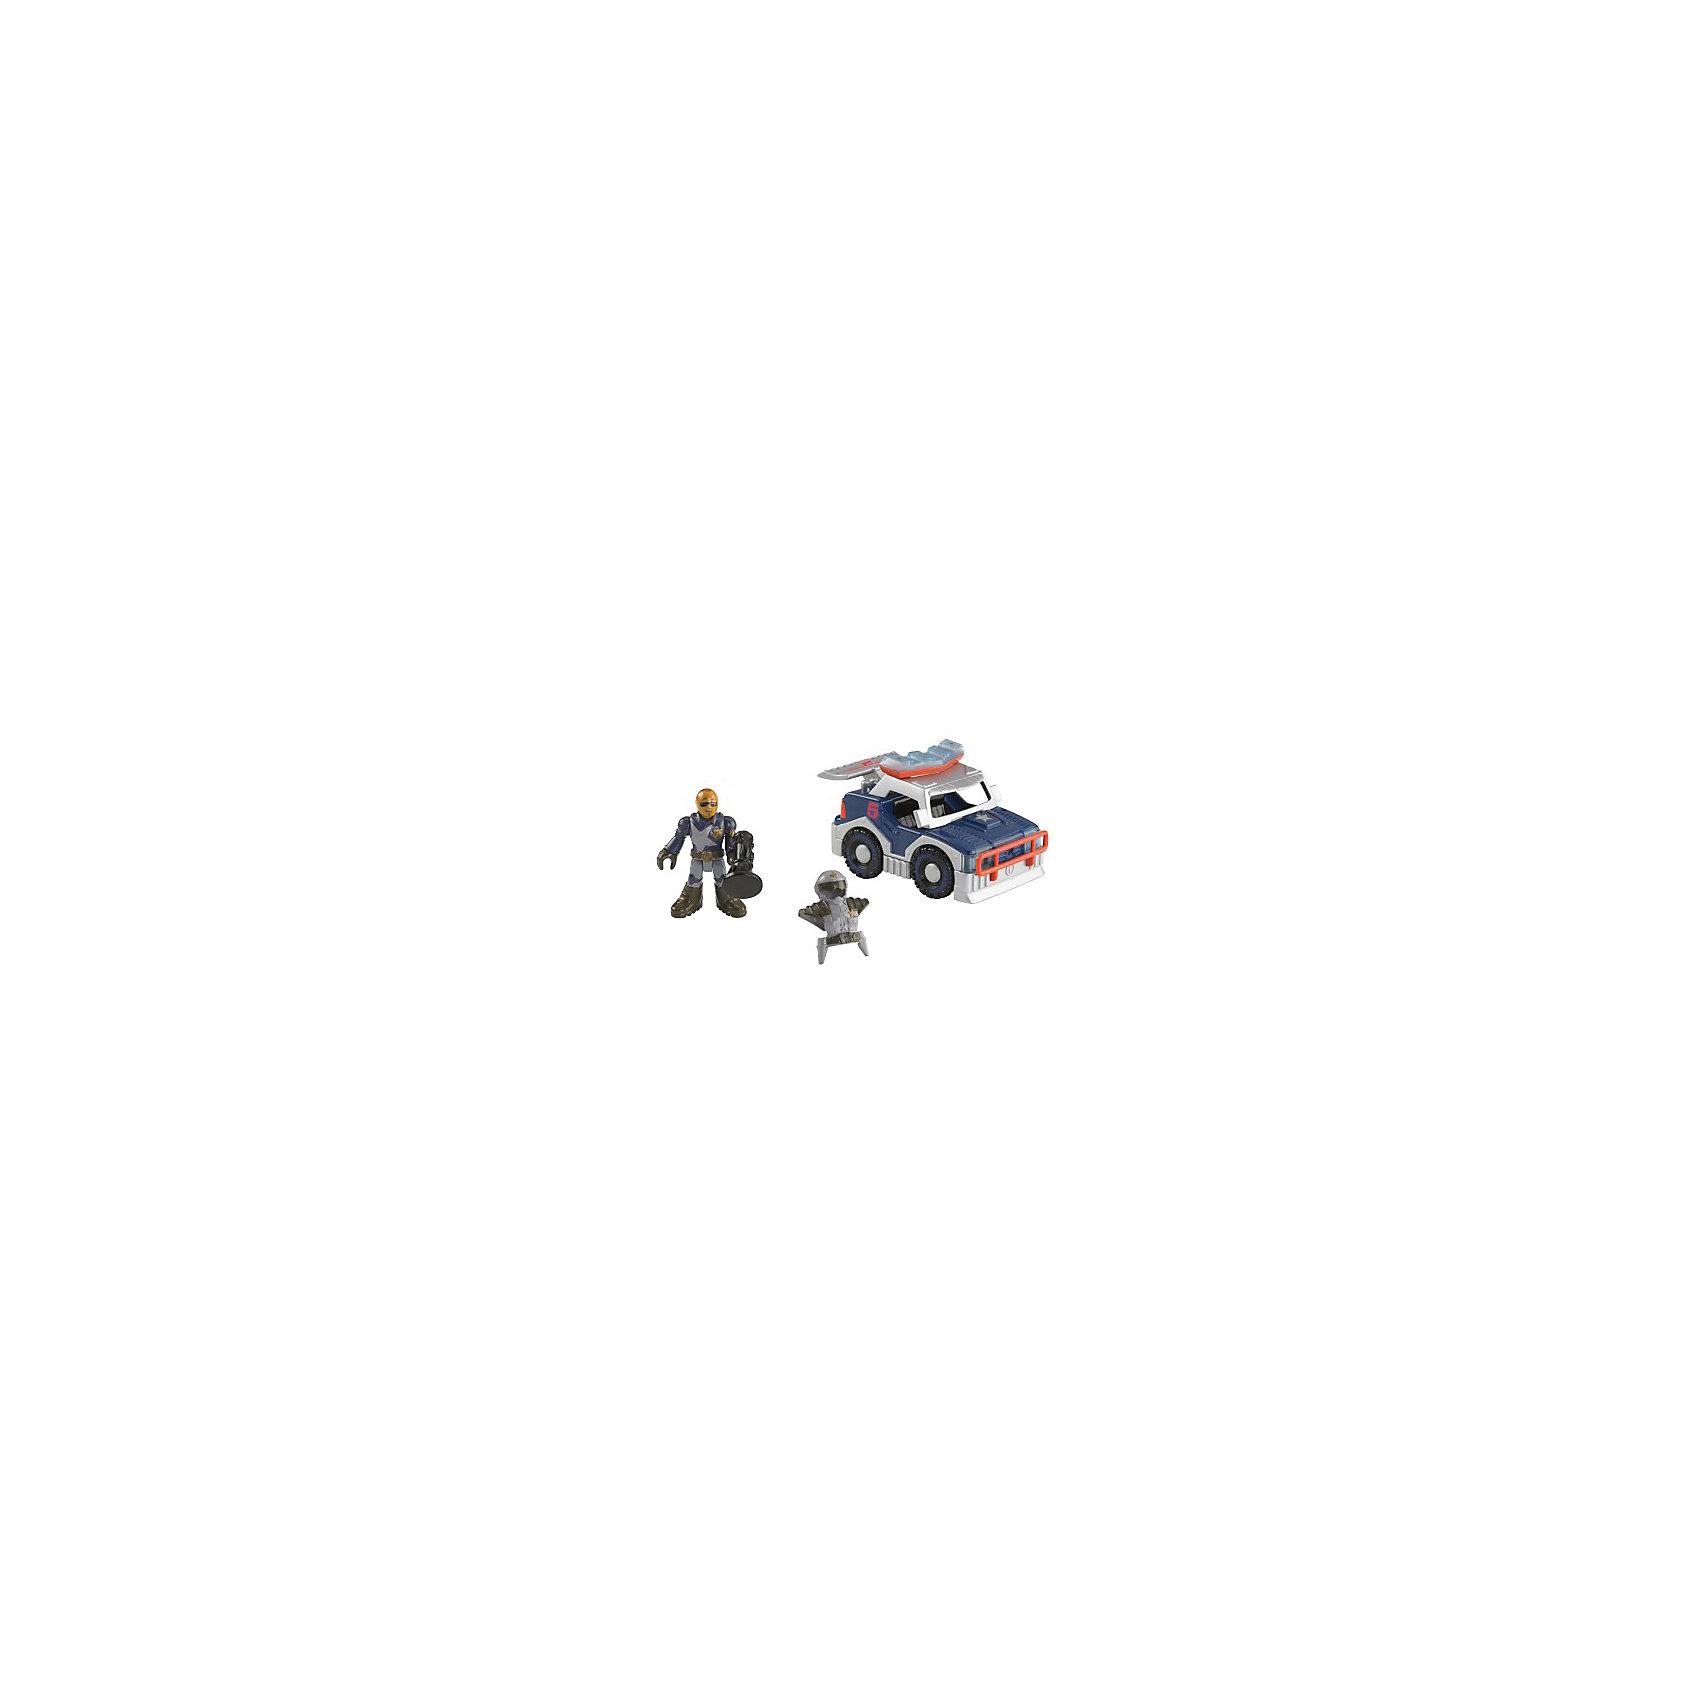 Mattel Набор Городские спасатели с аксессуарами, Imaginext, Fisher Price mattel базовая фигурка октонавты fisher price